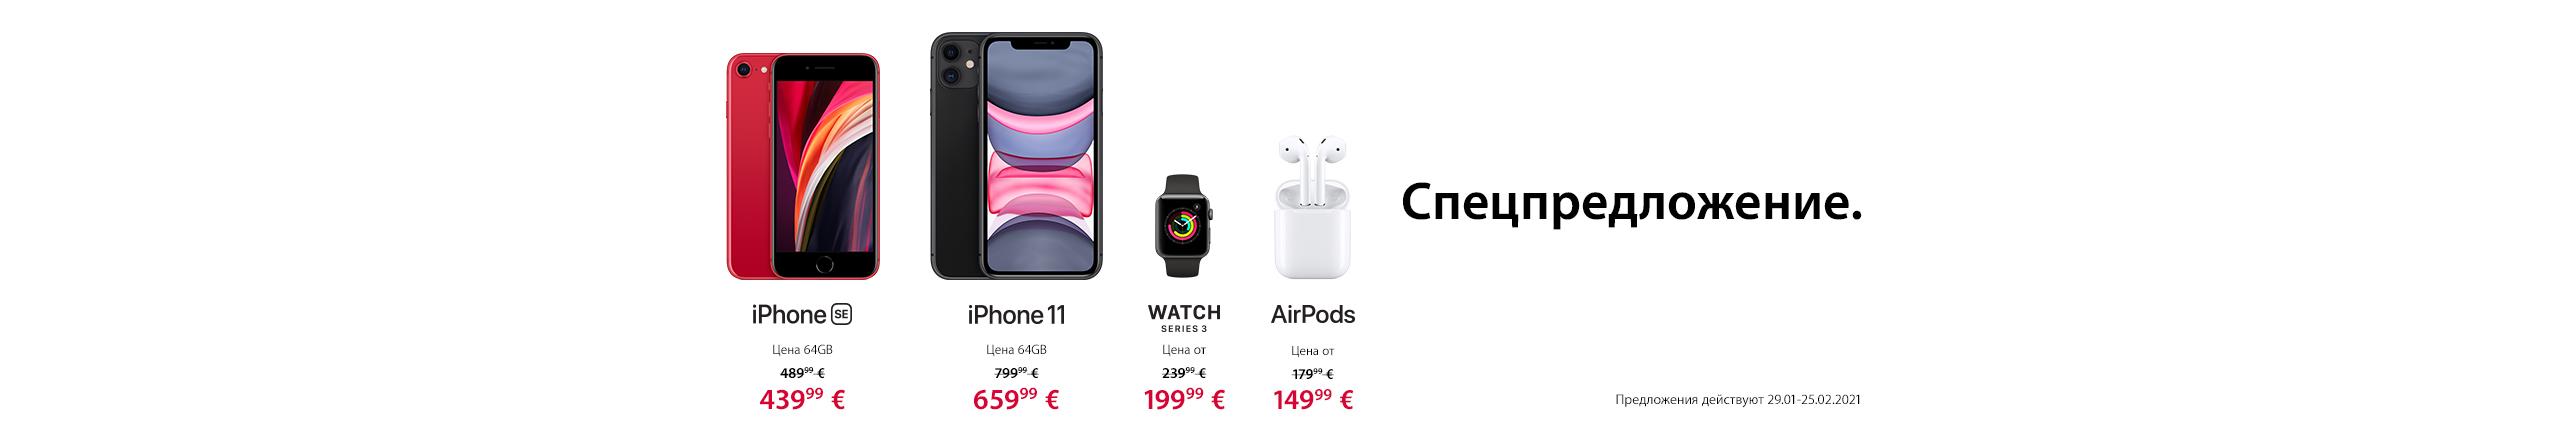 New FrontPageSlider Apple Спецпредложение